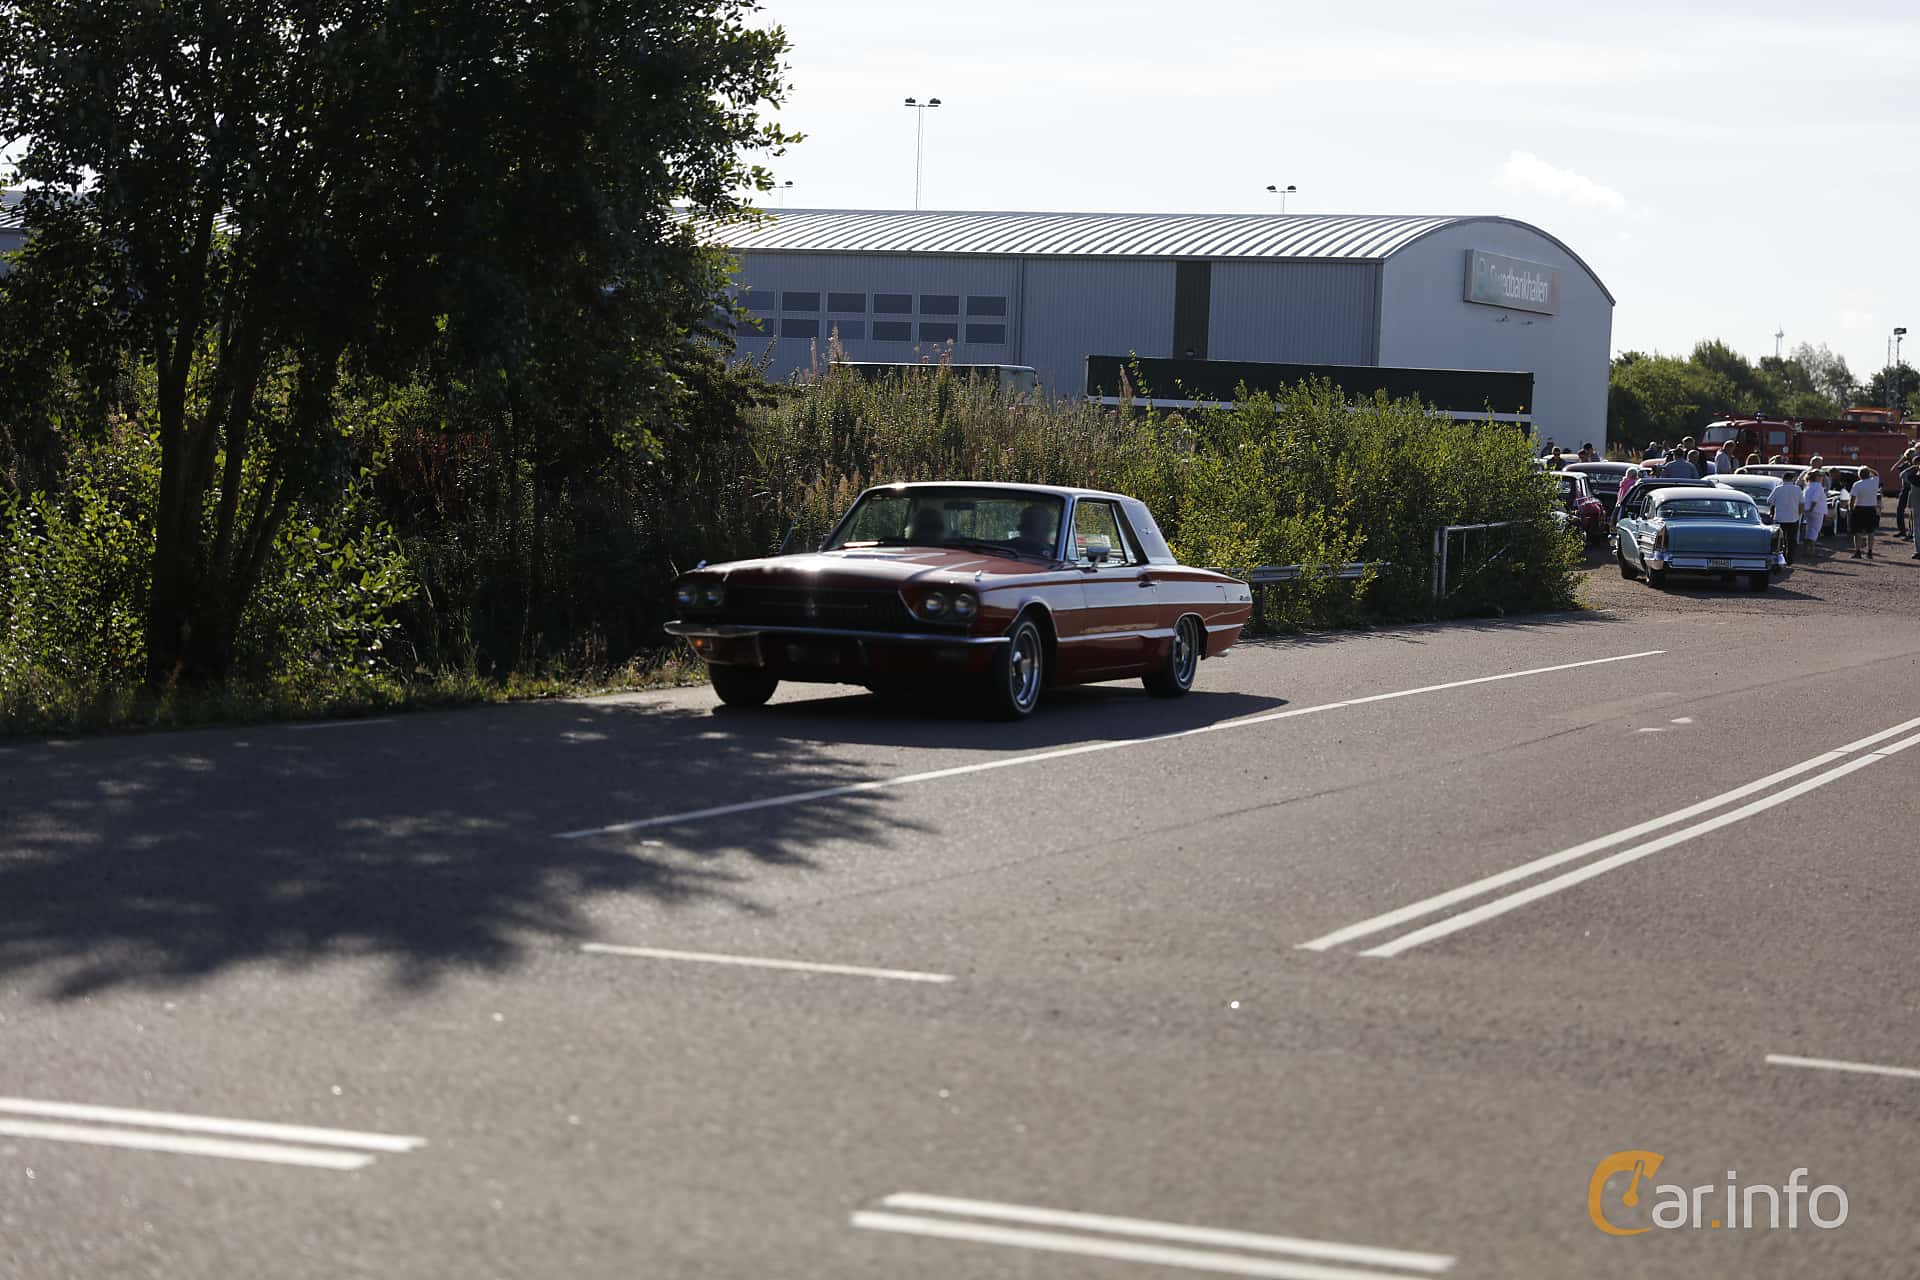 Ford Thunderbird Hardtop 6.4 V8 Automatic, 305hp, 1966 at Lergökarallyt 2018